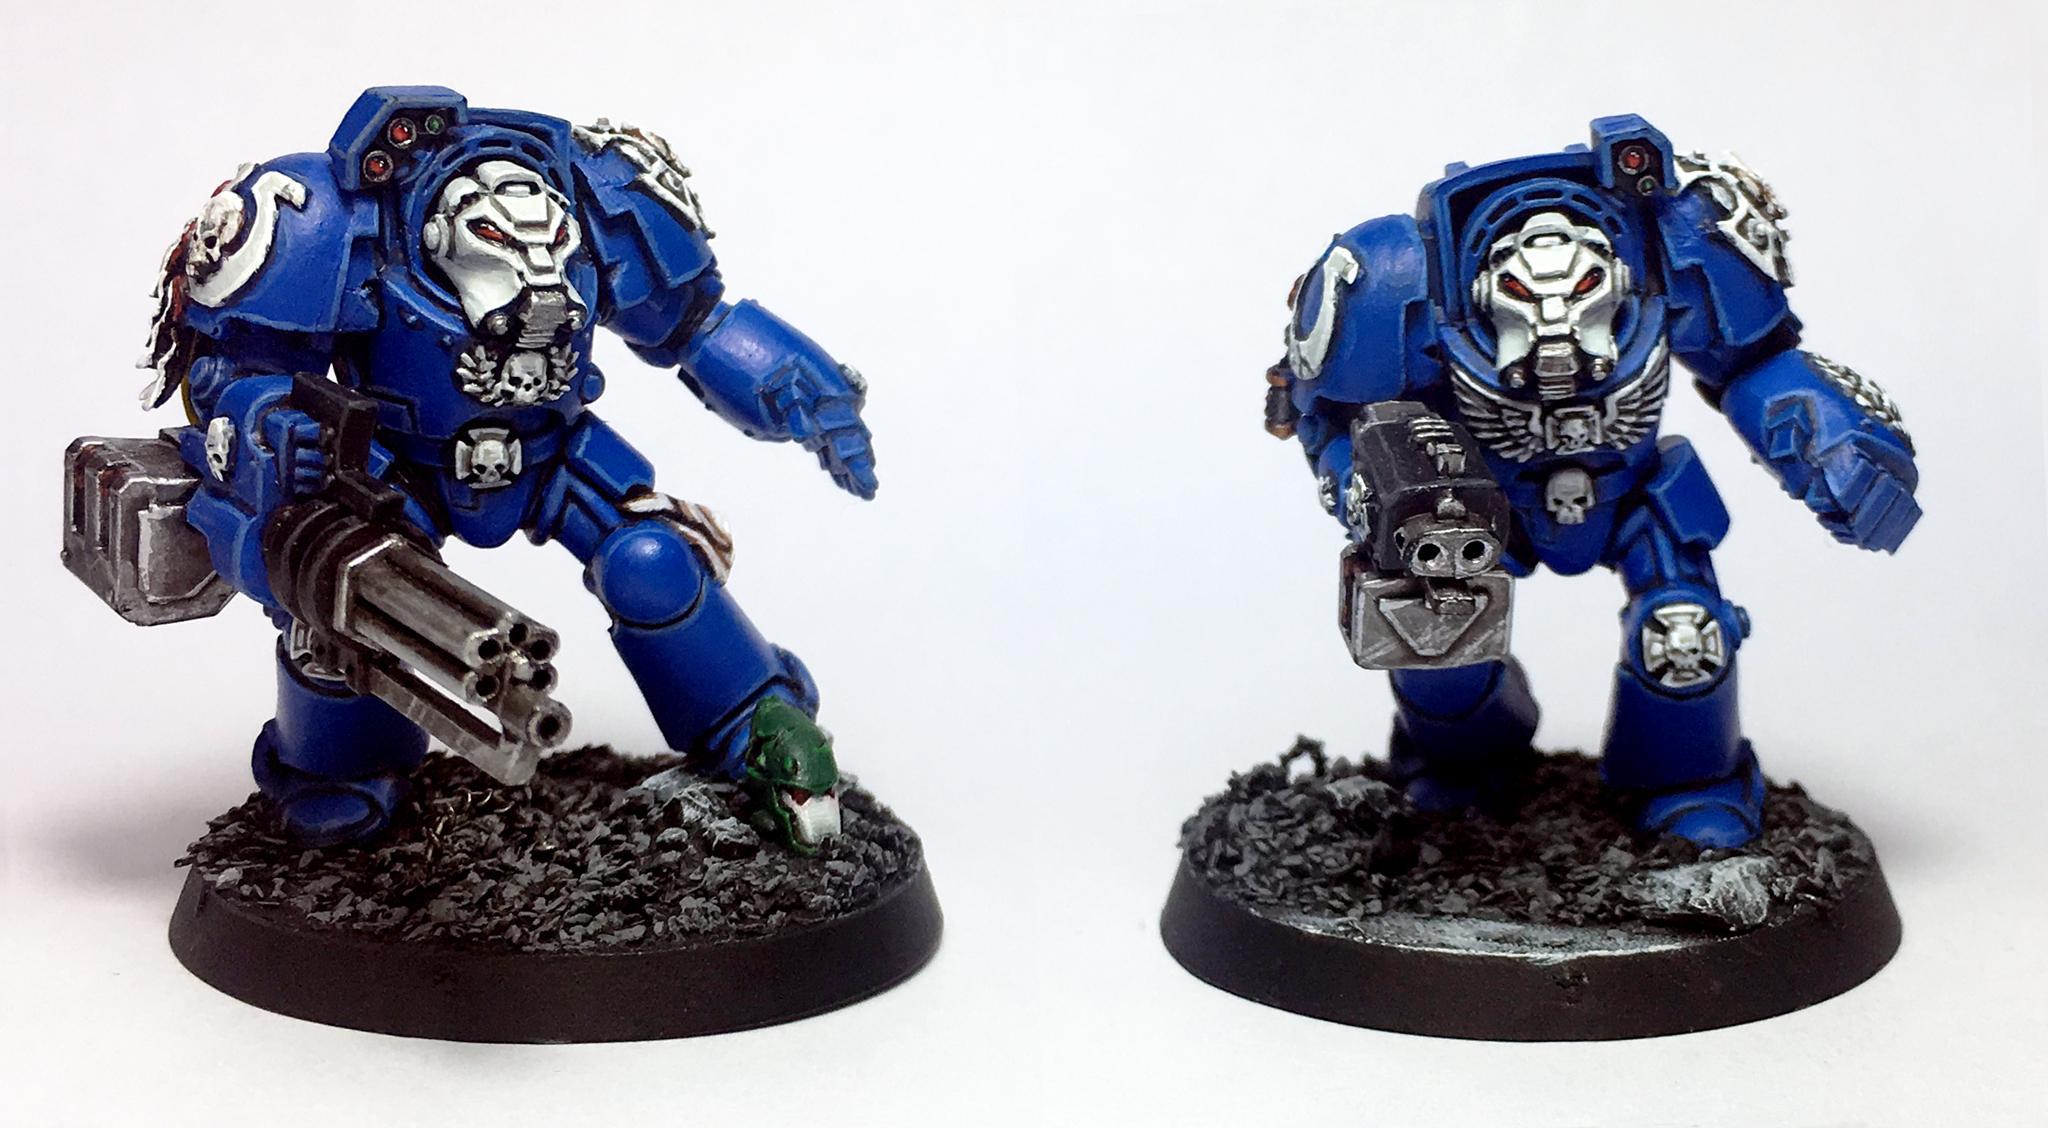 Adeptus Astartes, Space Marines, Squad, Terminator Armor, Ultramarines, Warhammer 40,000